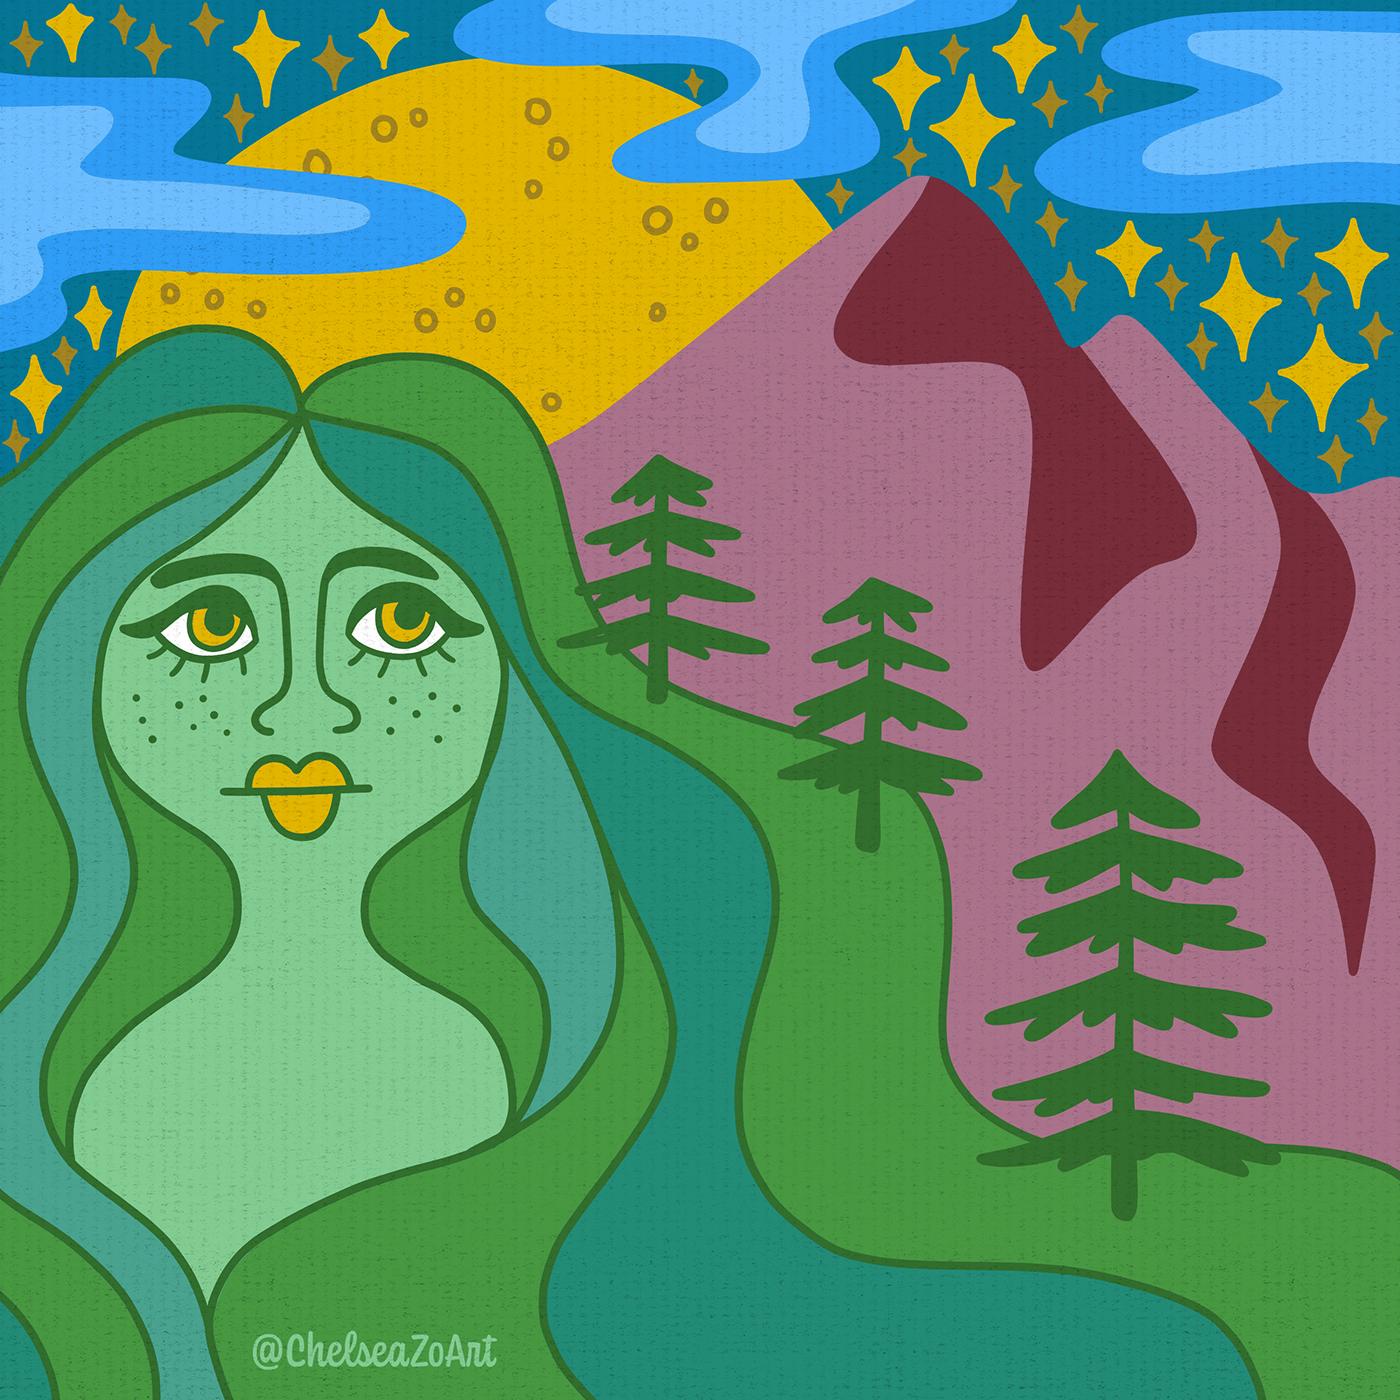 groovy hippie Mama mother mountain mushroom Nature Retro woman